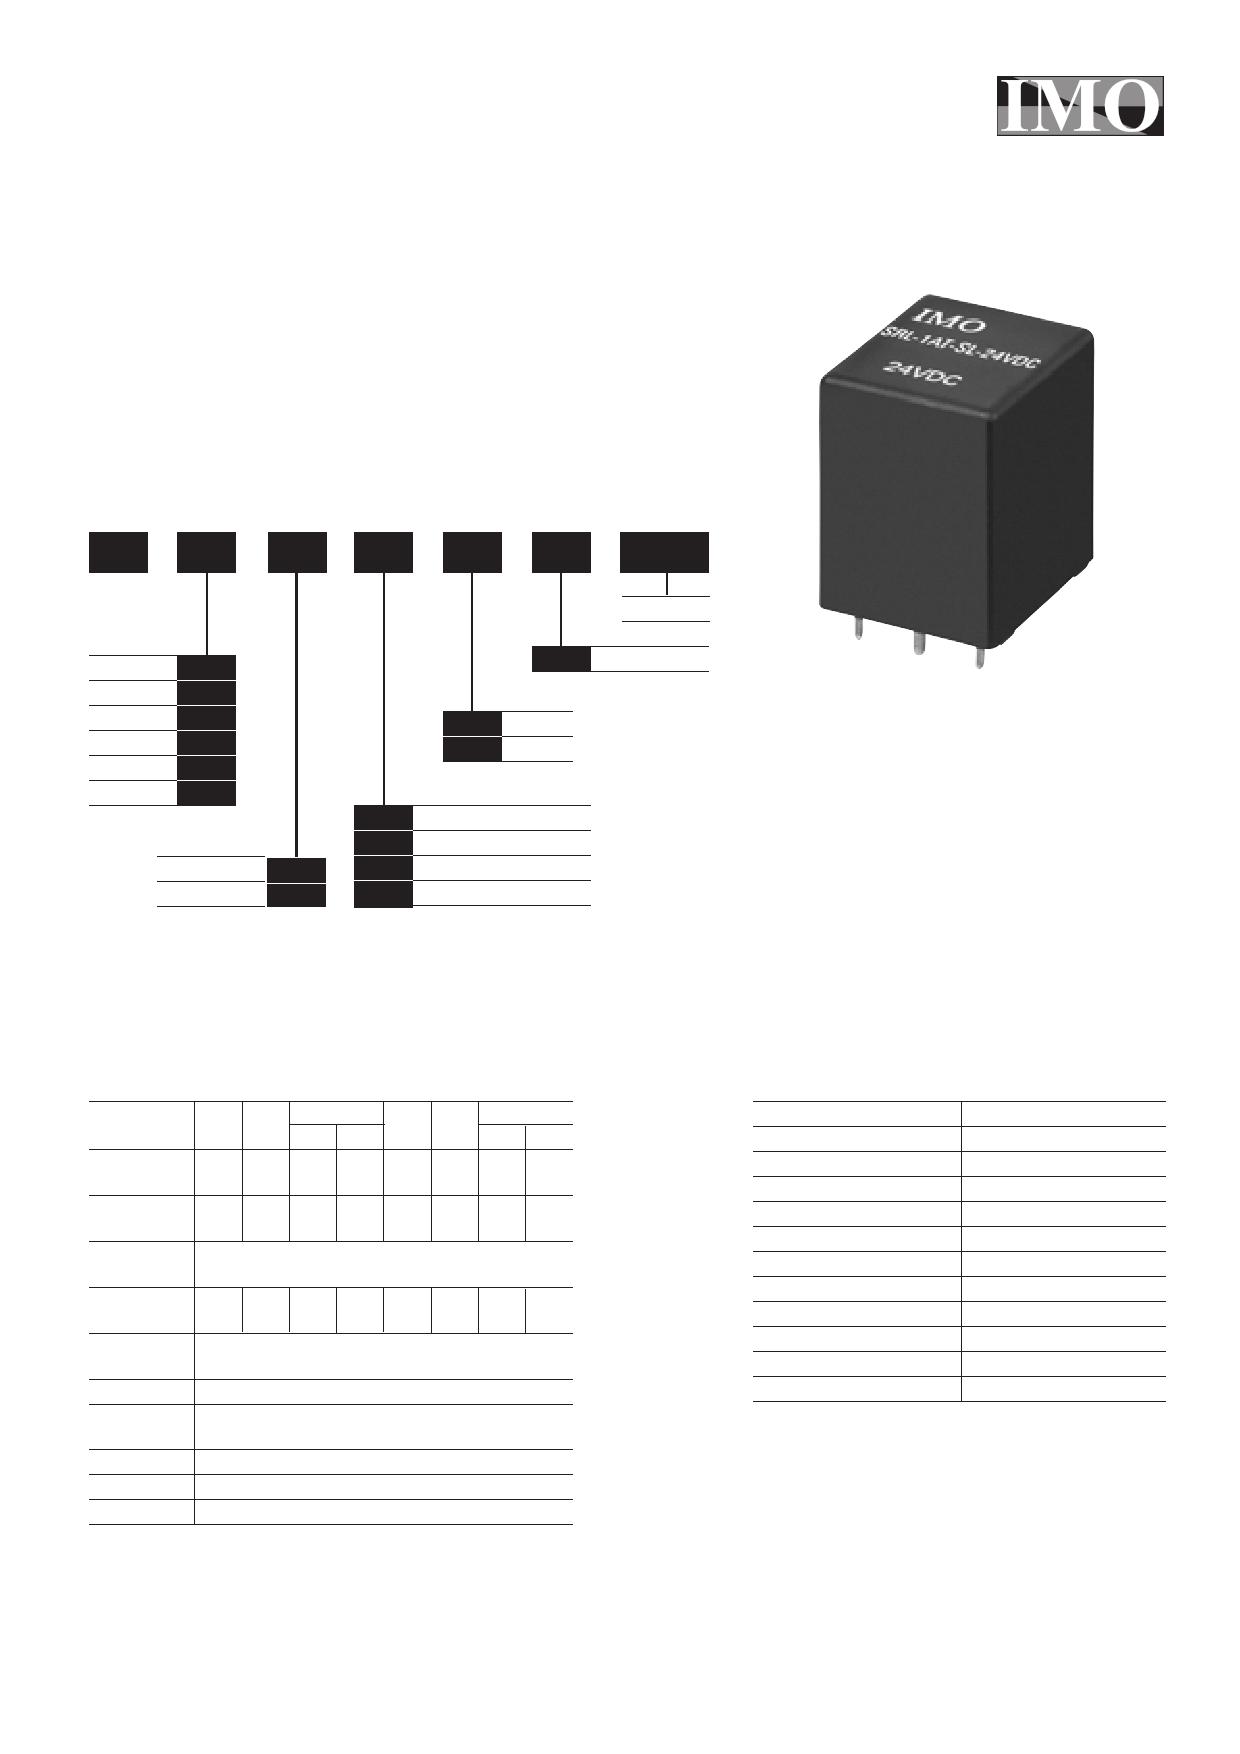 srl-1ut datasheet pdf    u0434 u0430 u0442 u0430 u0448 u0438 u0442